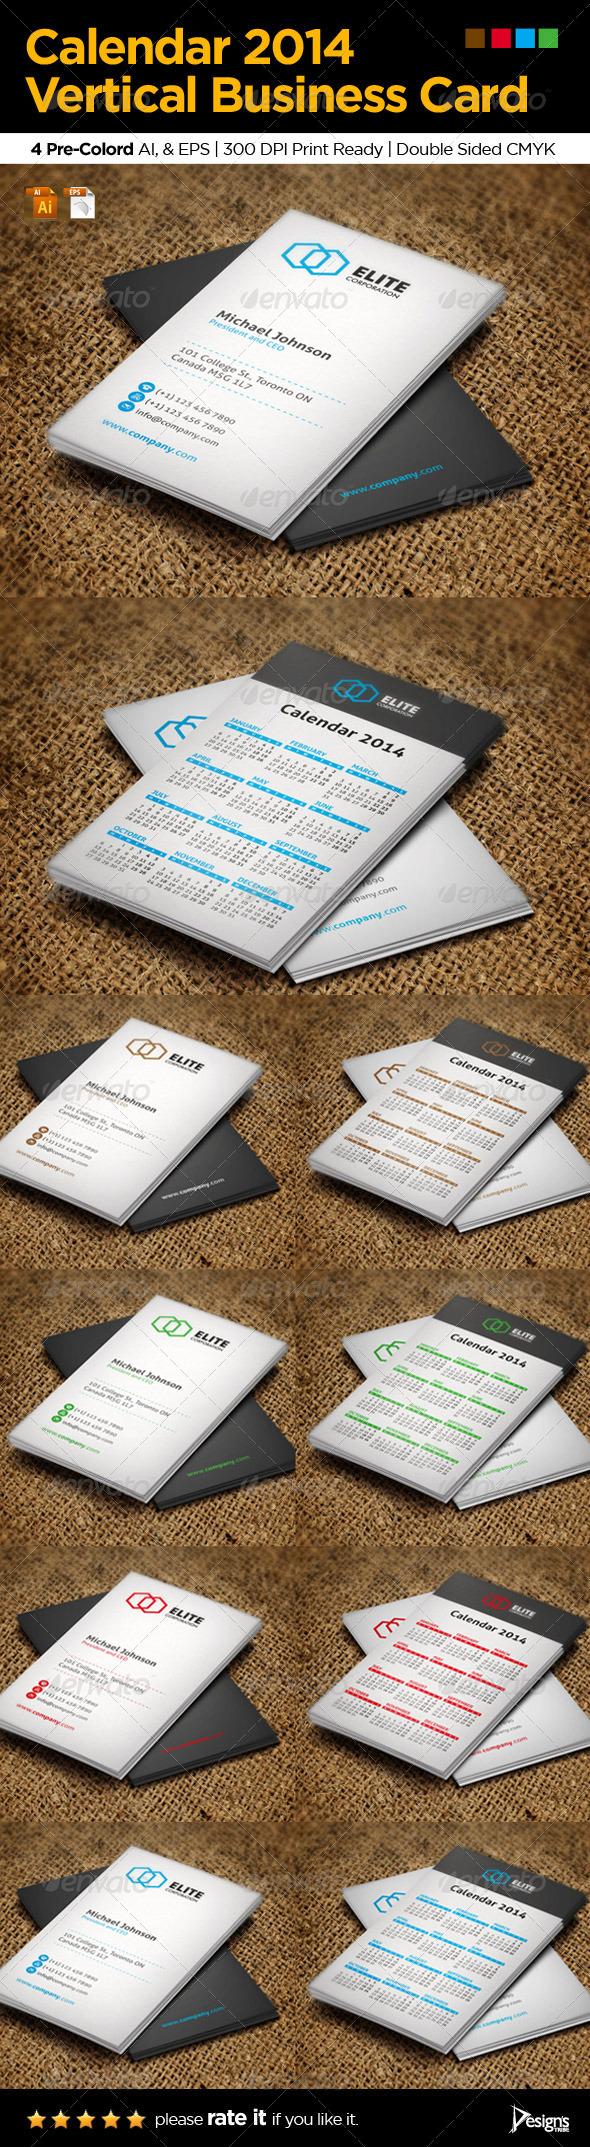 GraphicRiver Calendar 2014 Vertical Business Card 5924271